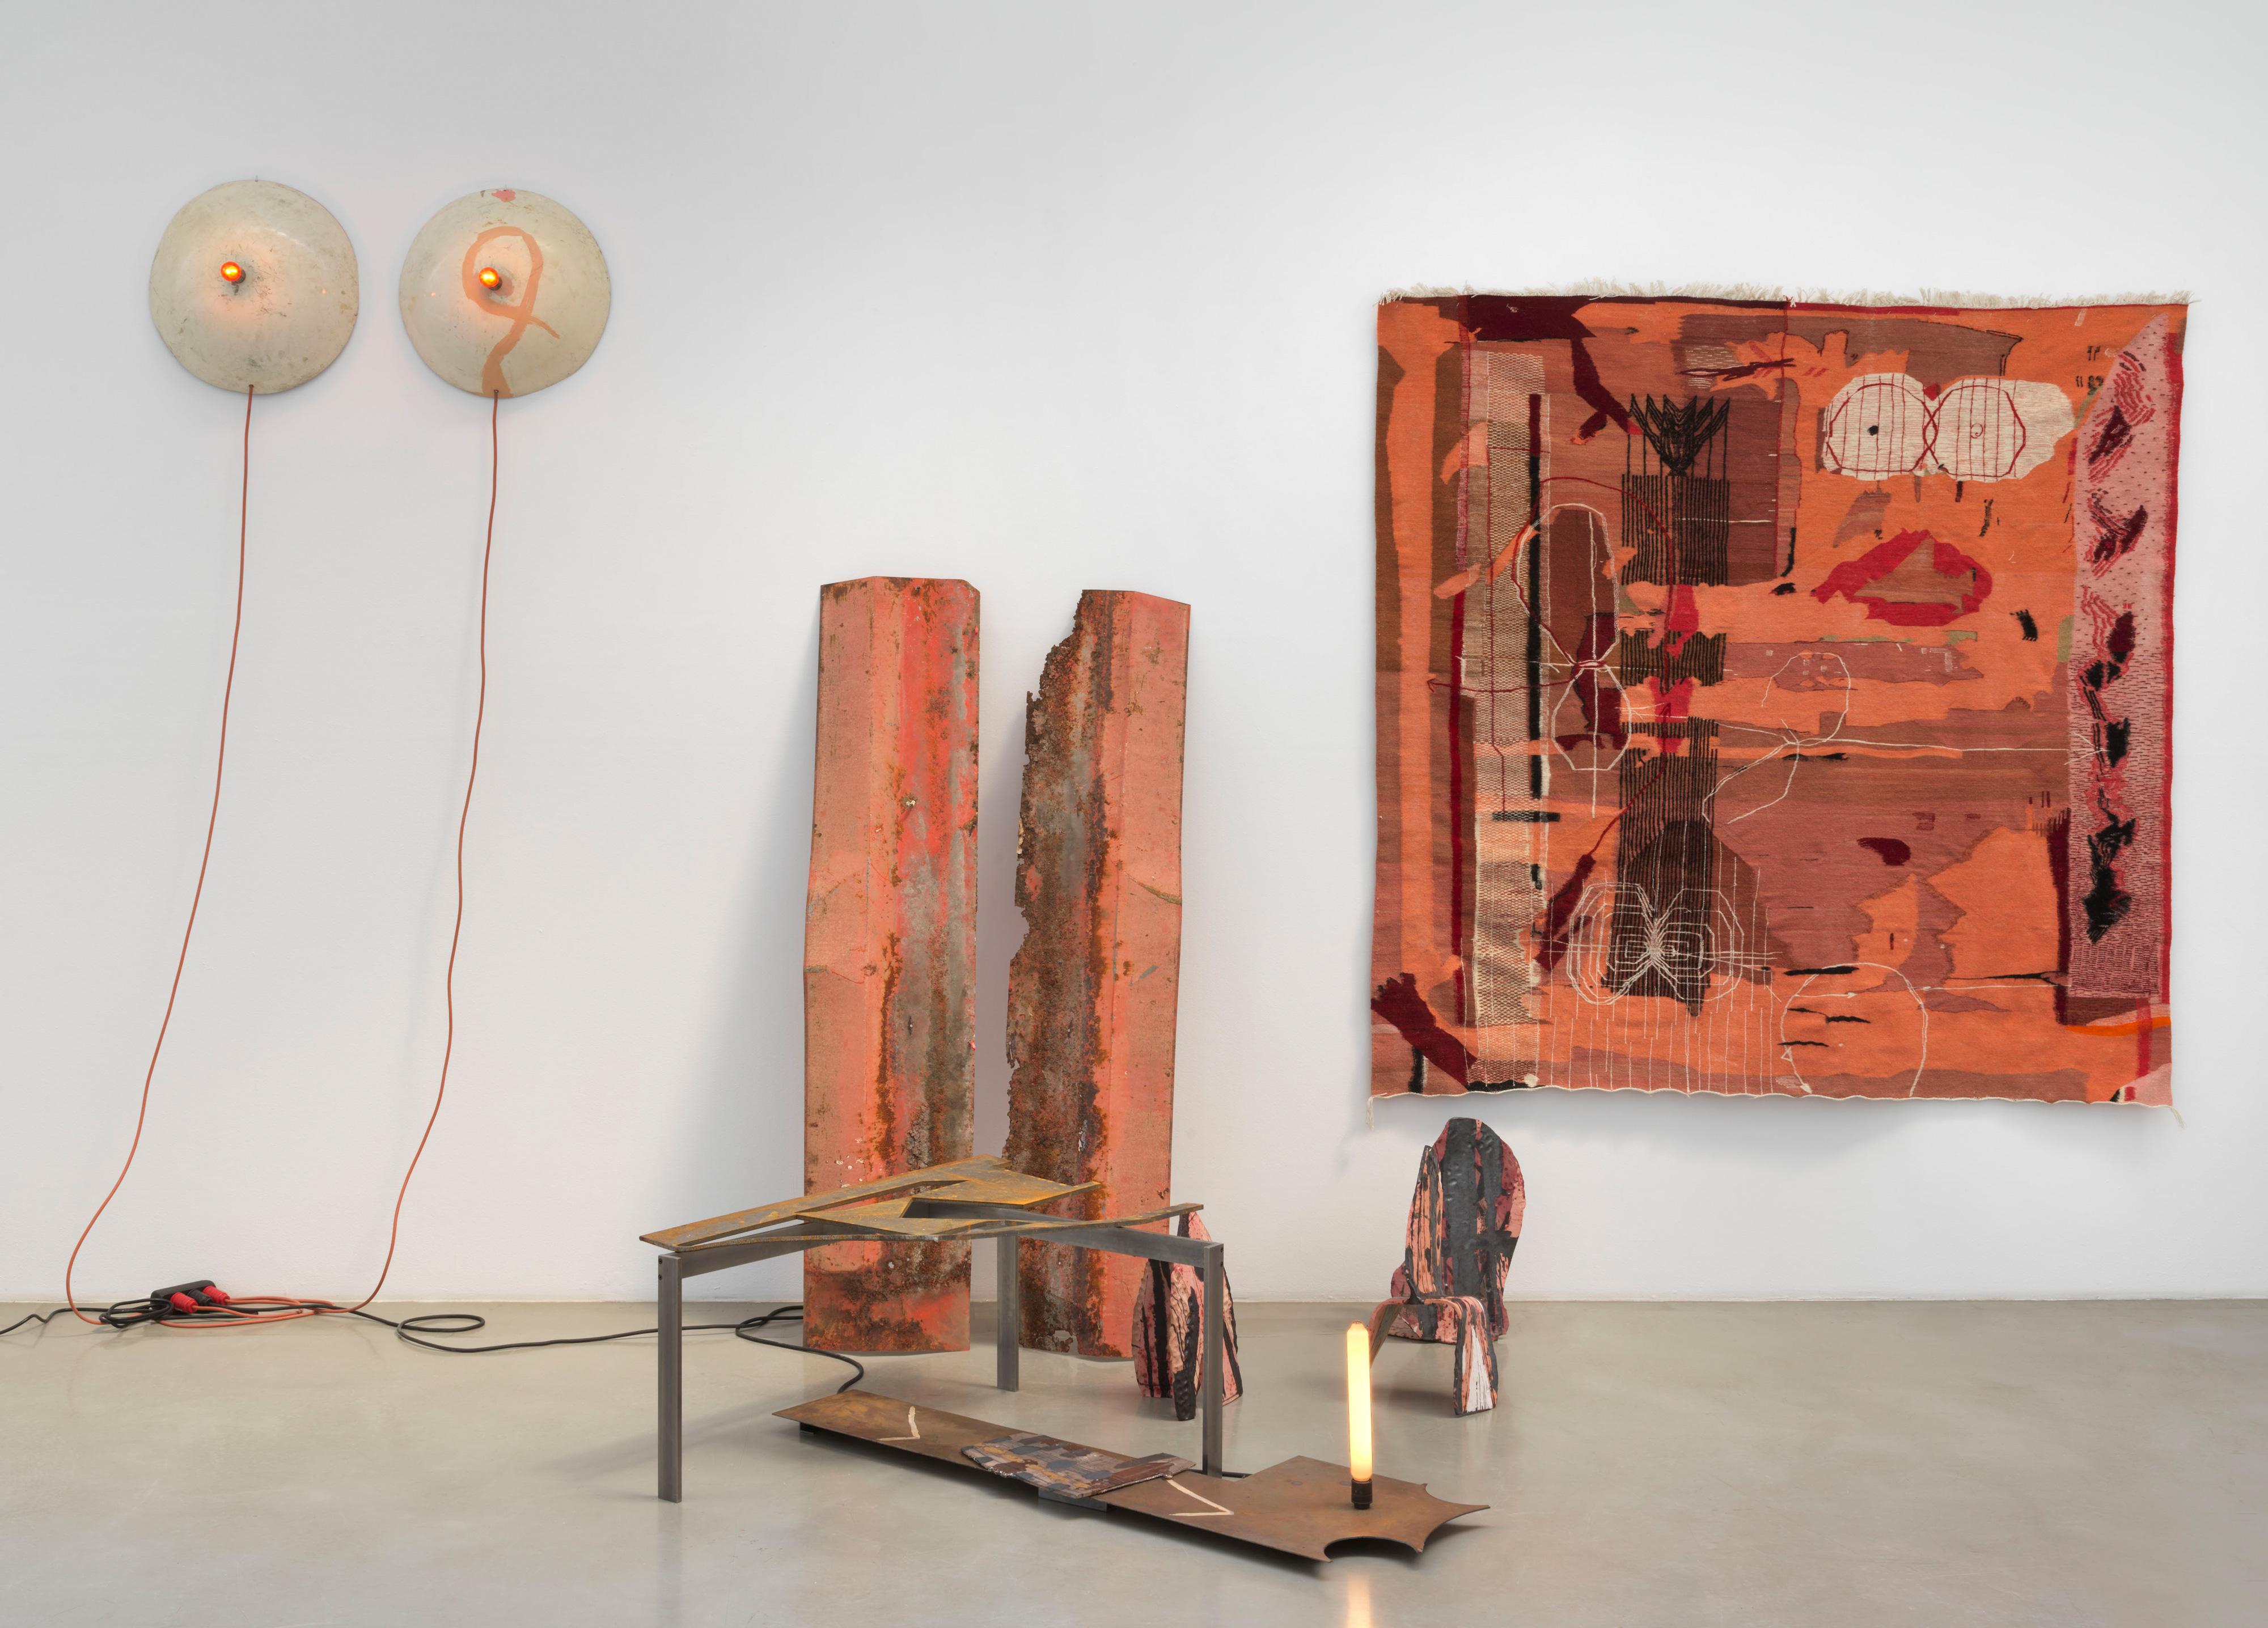 Galerie Barbara Thumm \ Sarah Entwistle: The tantalizing and ruinous link of the telephone. (SEn-21-012) \ The tantalizing and ruinous link of the telephone. (2021)